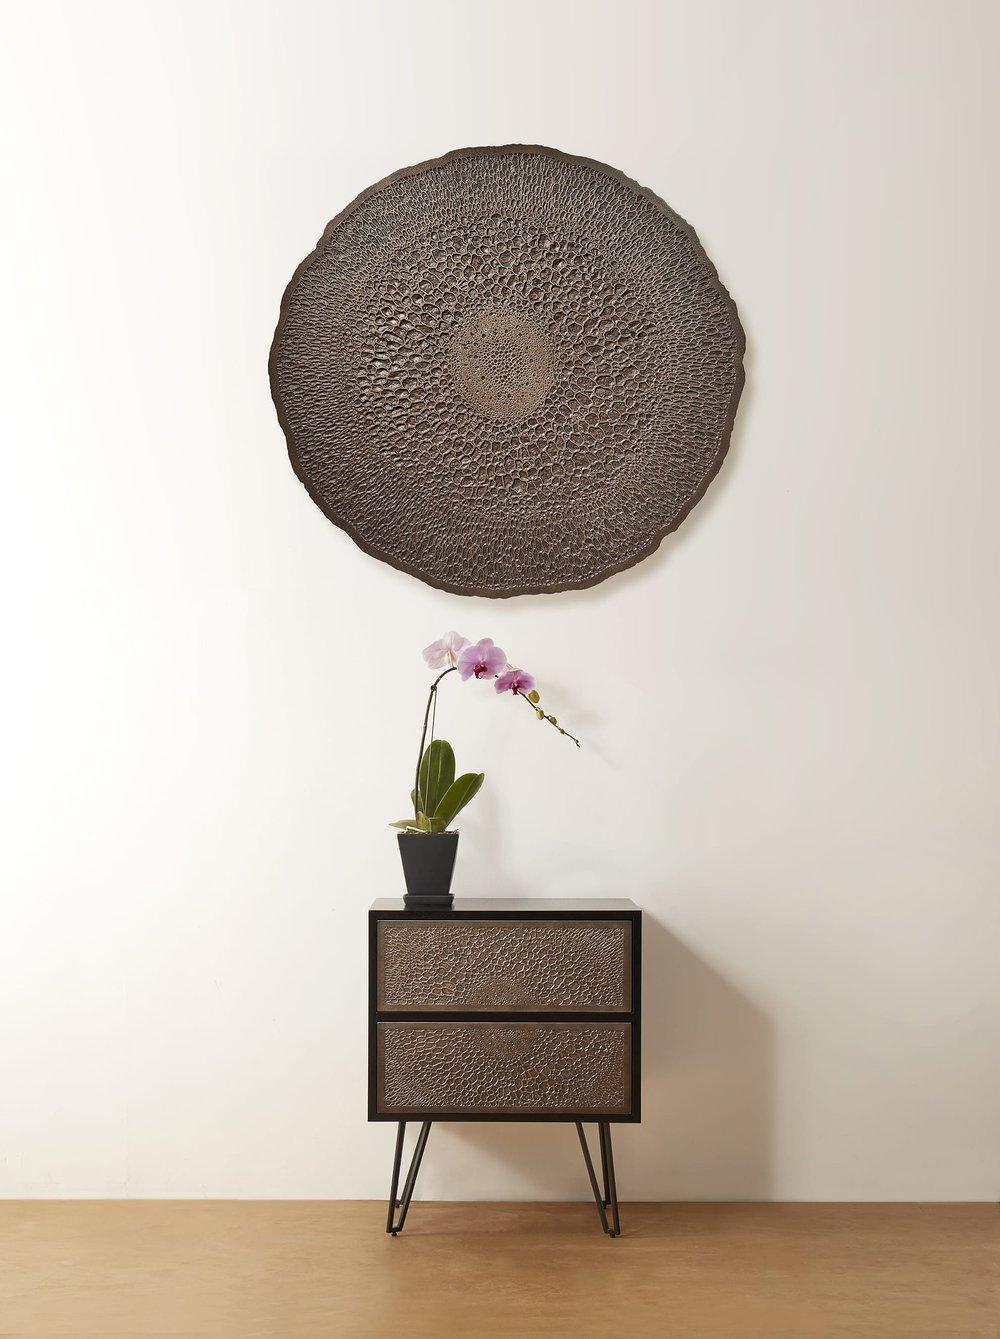 Mendel Project - Liquid Metal Furniture - Francois Hurtaud Design - Orchid Art Piece.jpg